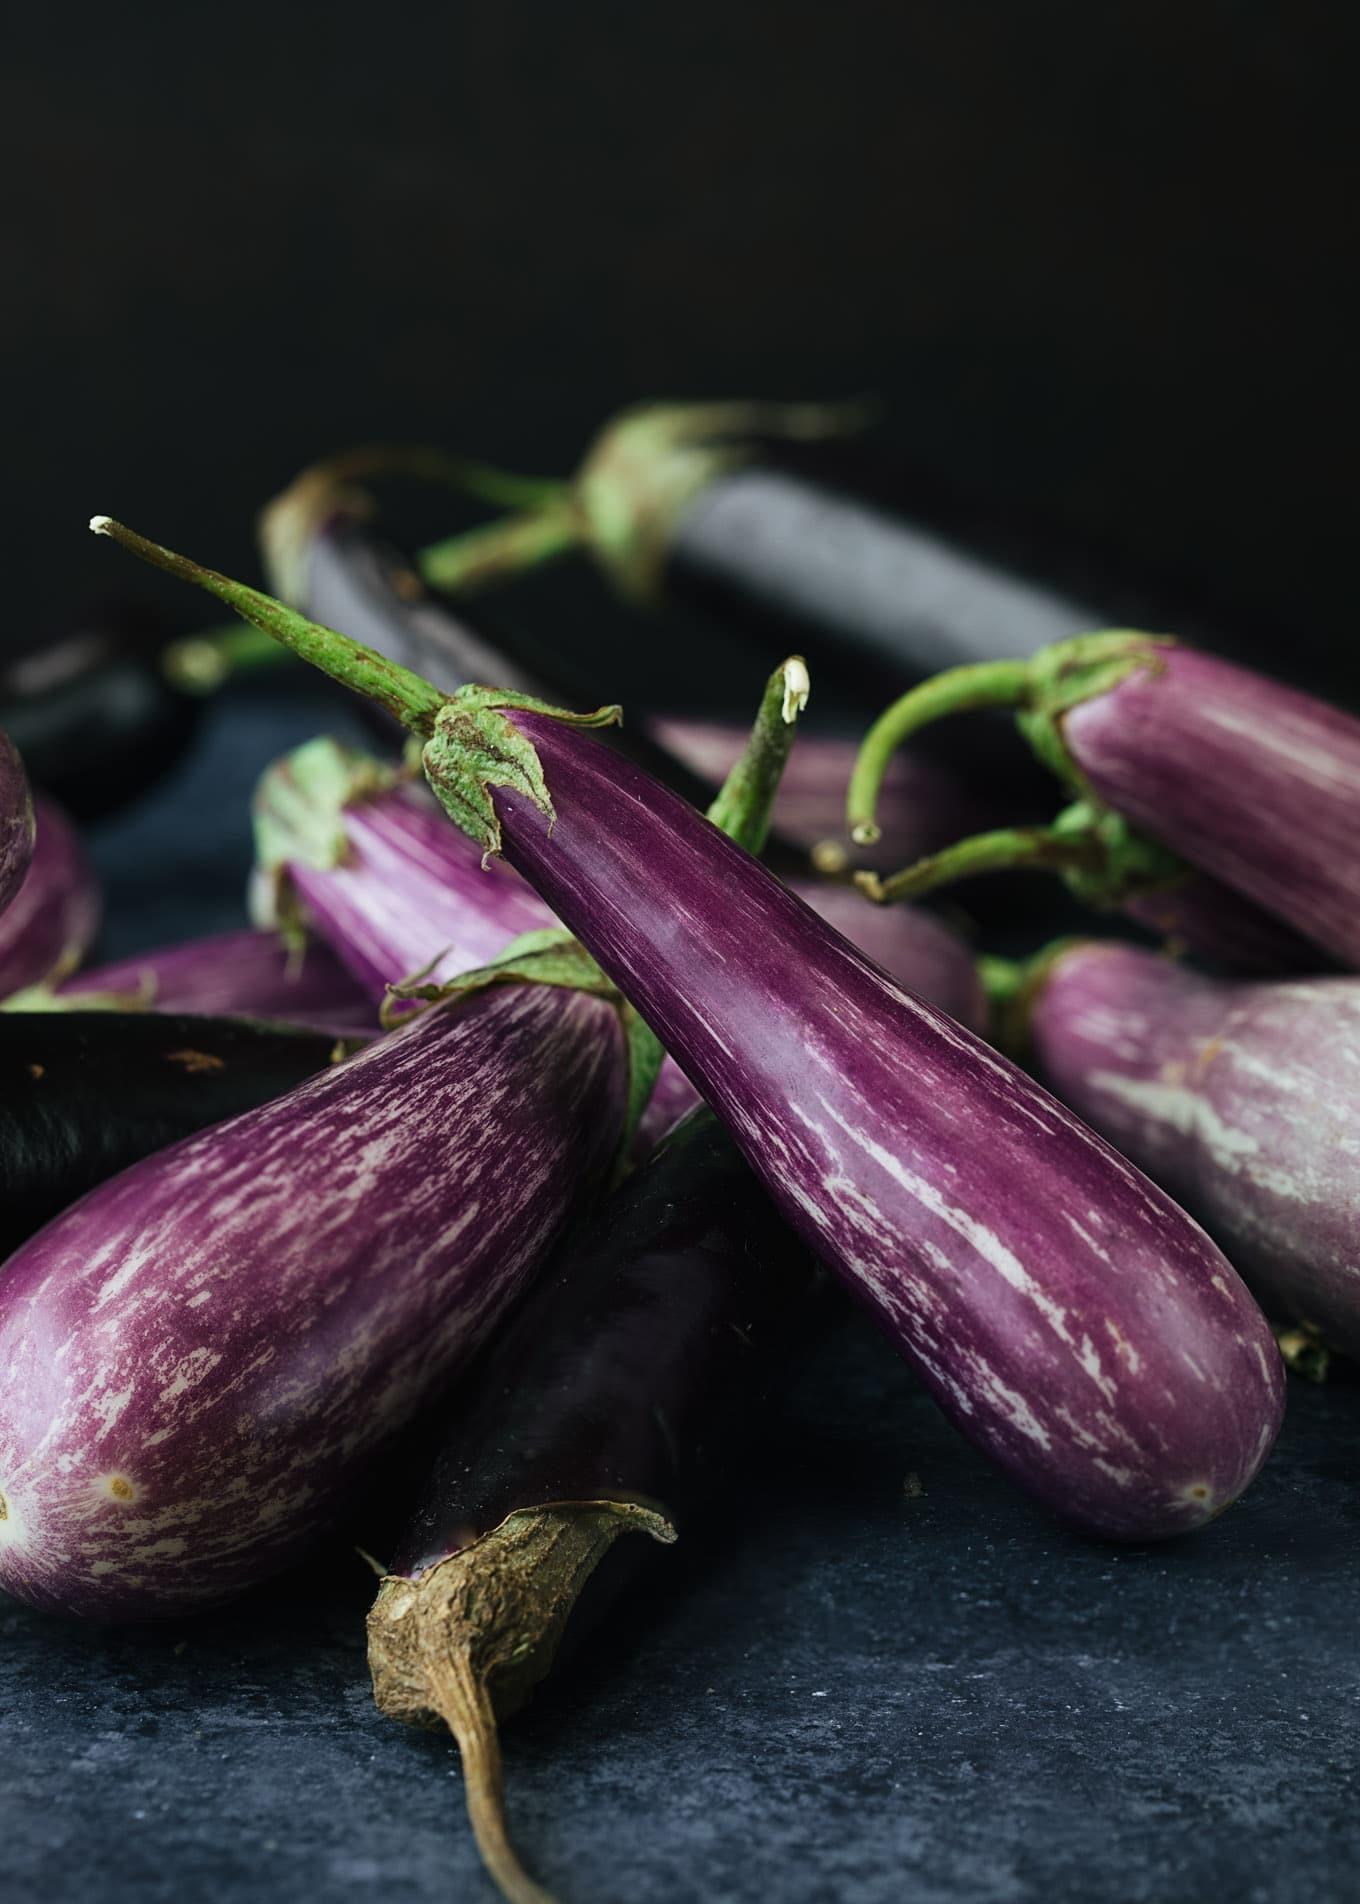 roasted eggplant and cherry tomato sauce